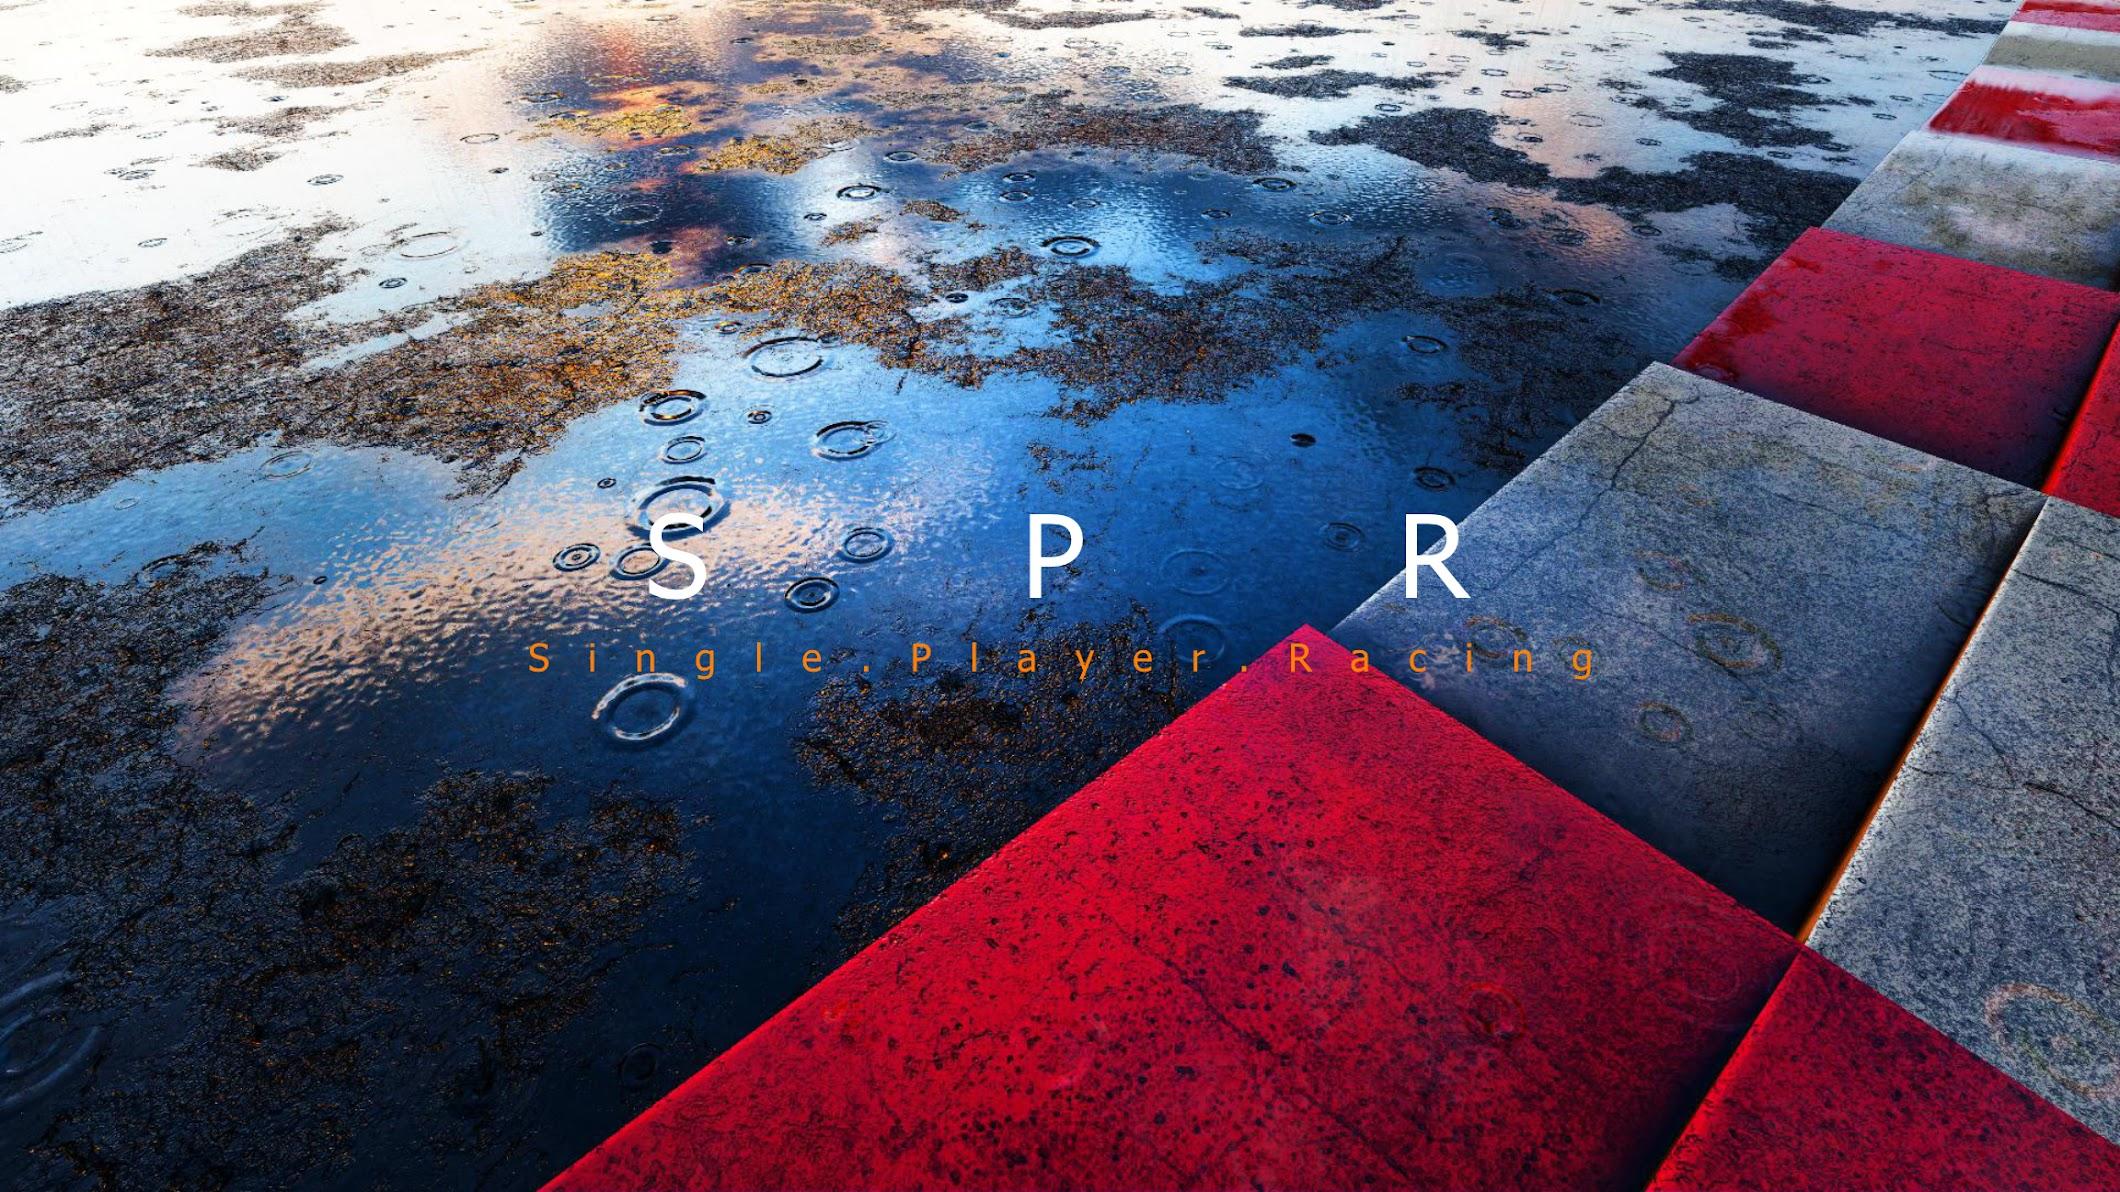 SPR: Single Player Racing